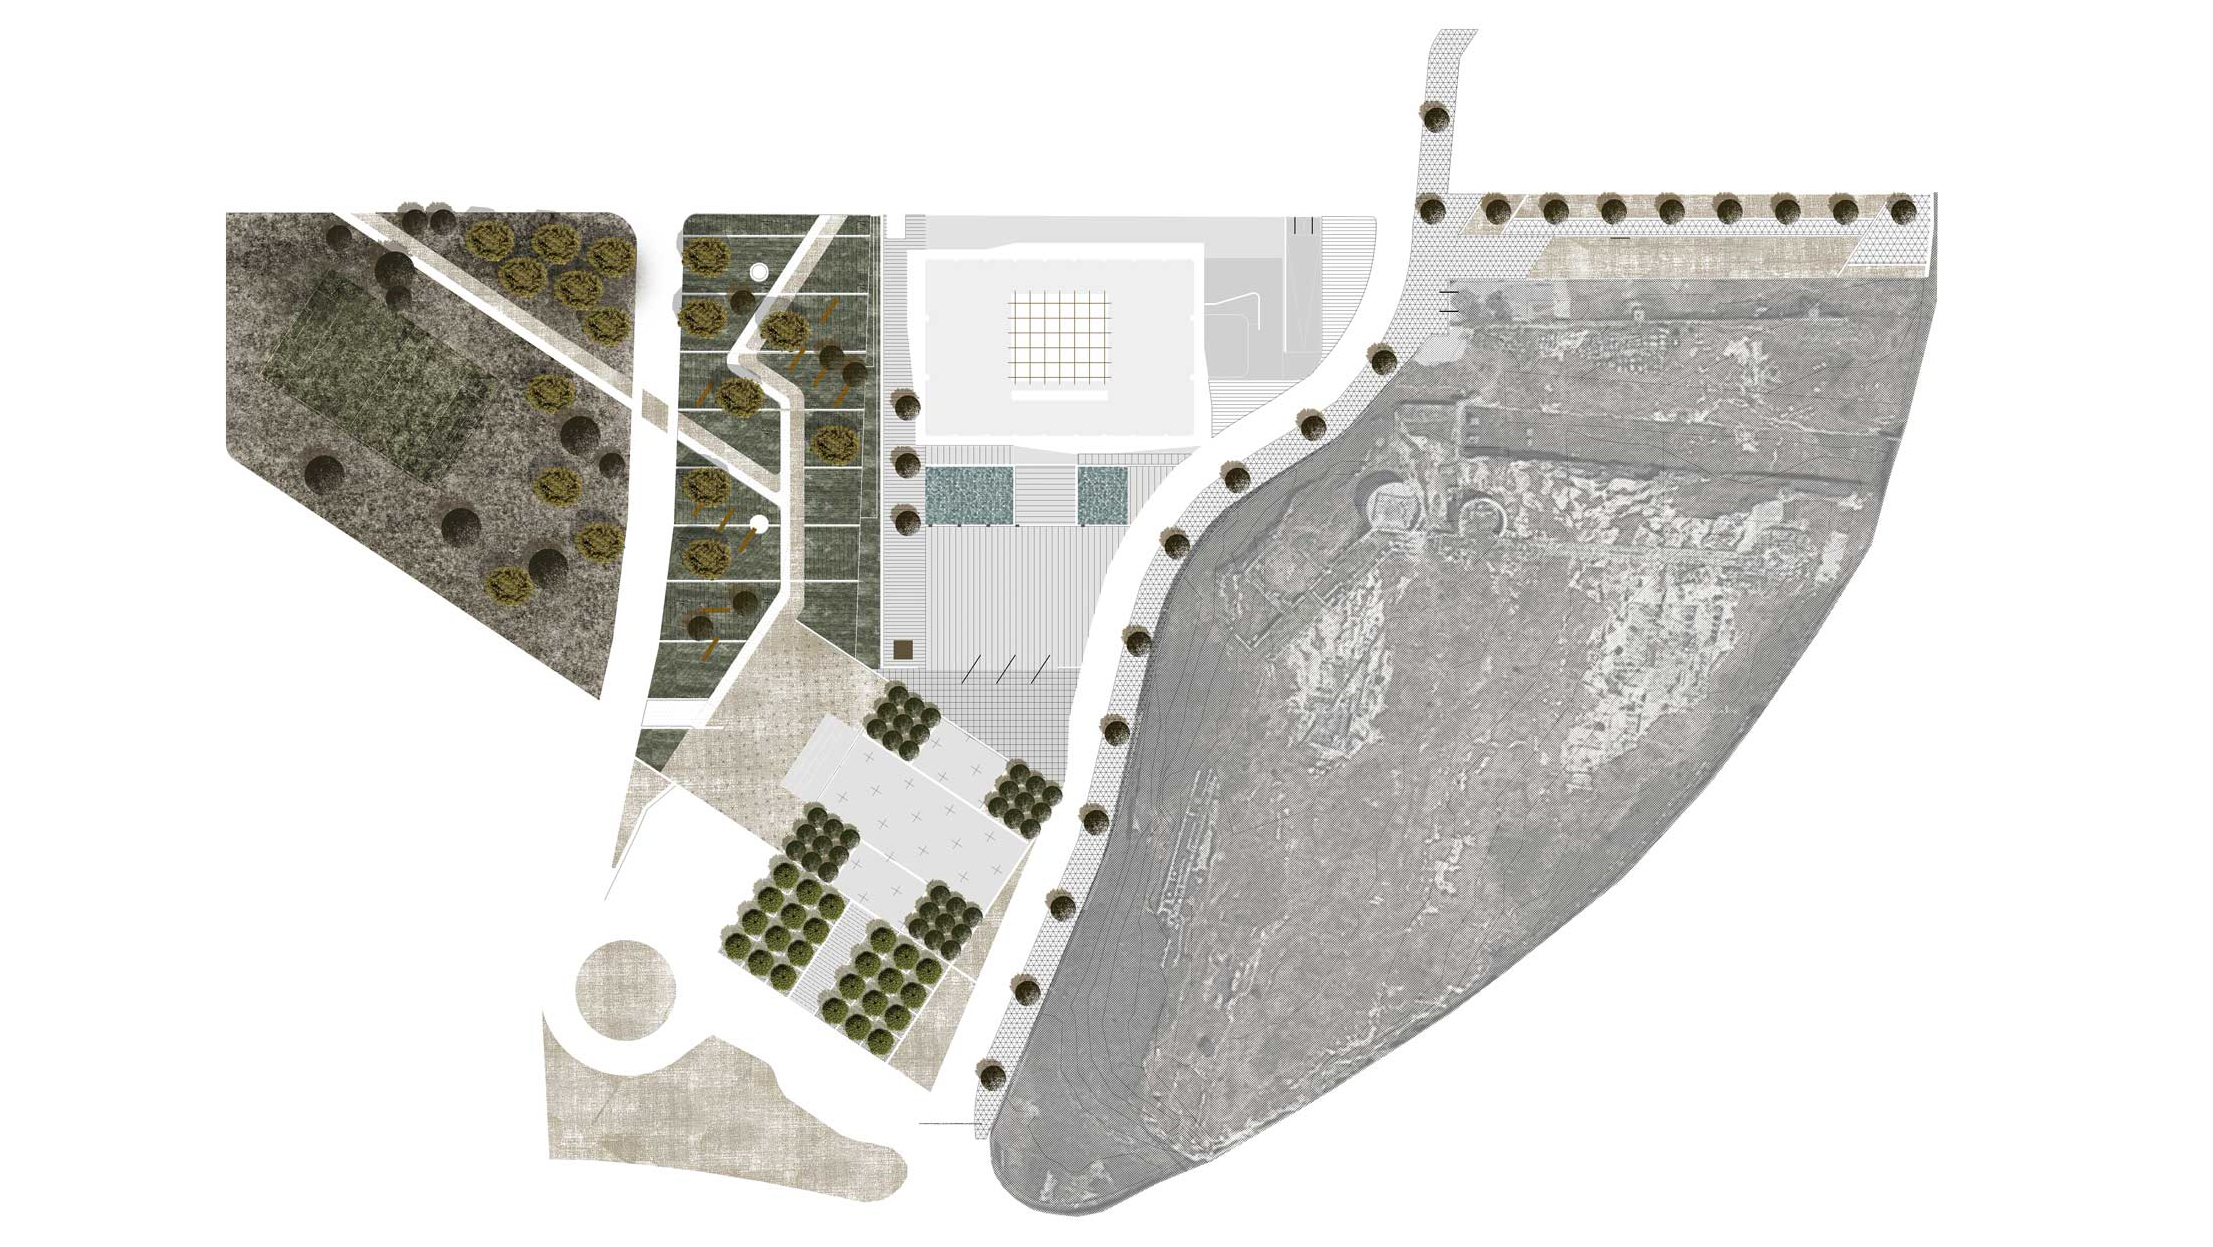 Projects - Piraeus Periscope